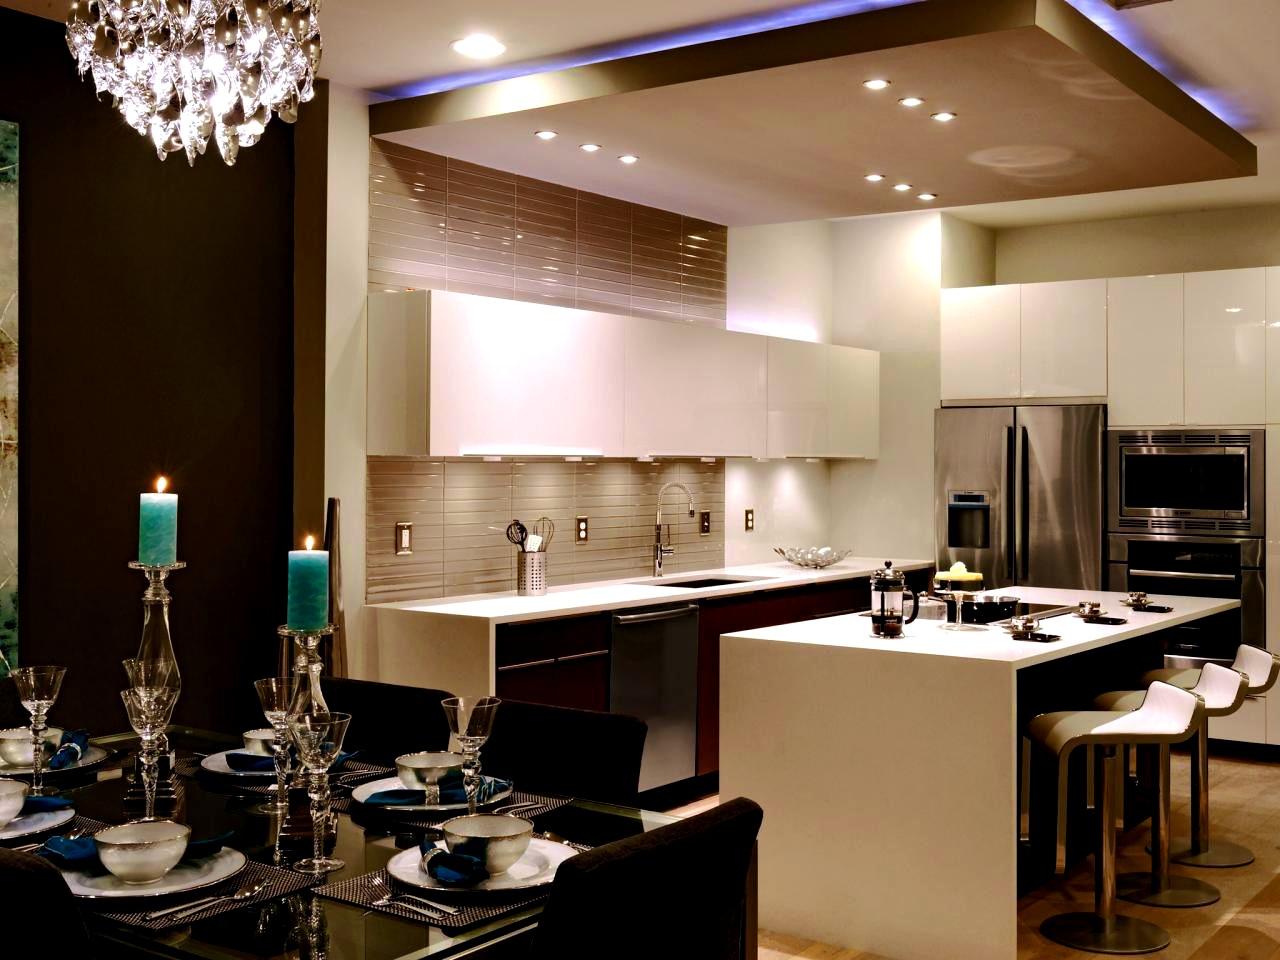 سقف کاذب آشپزخانه 9